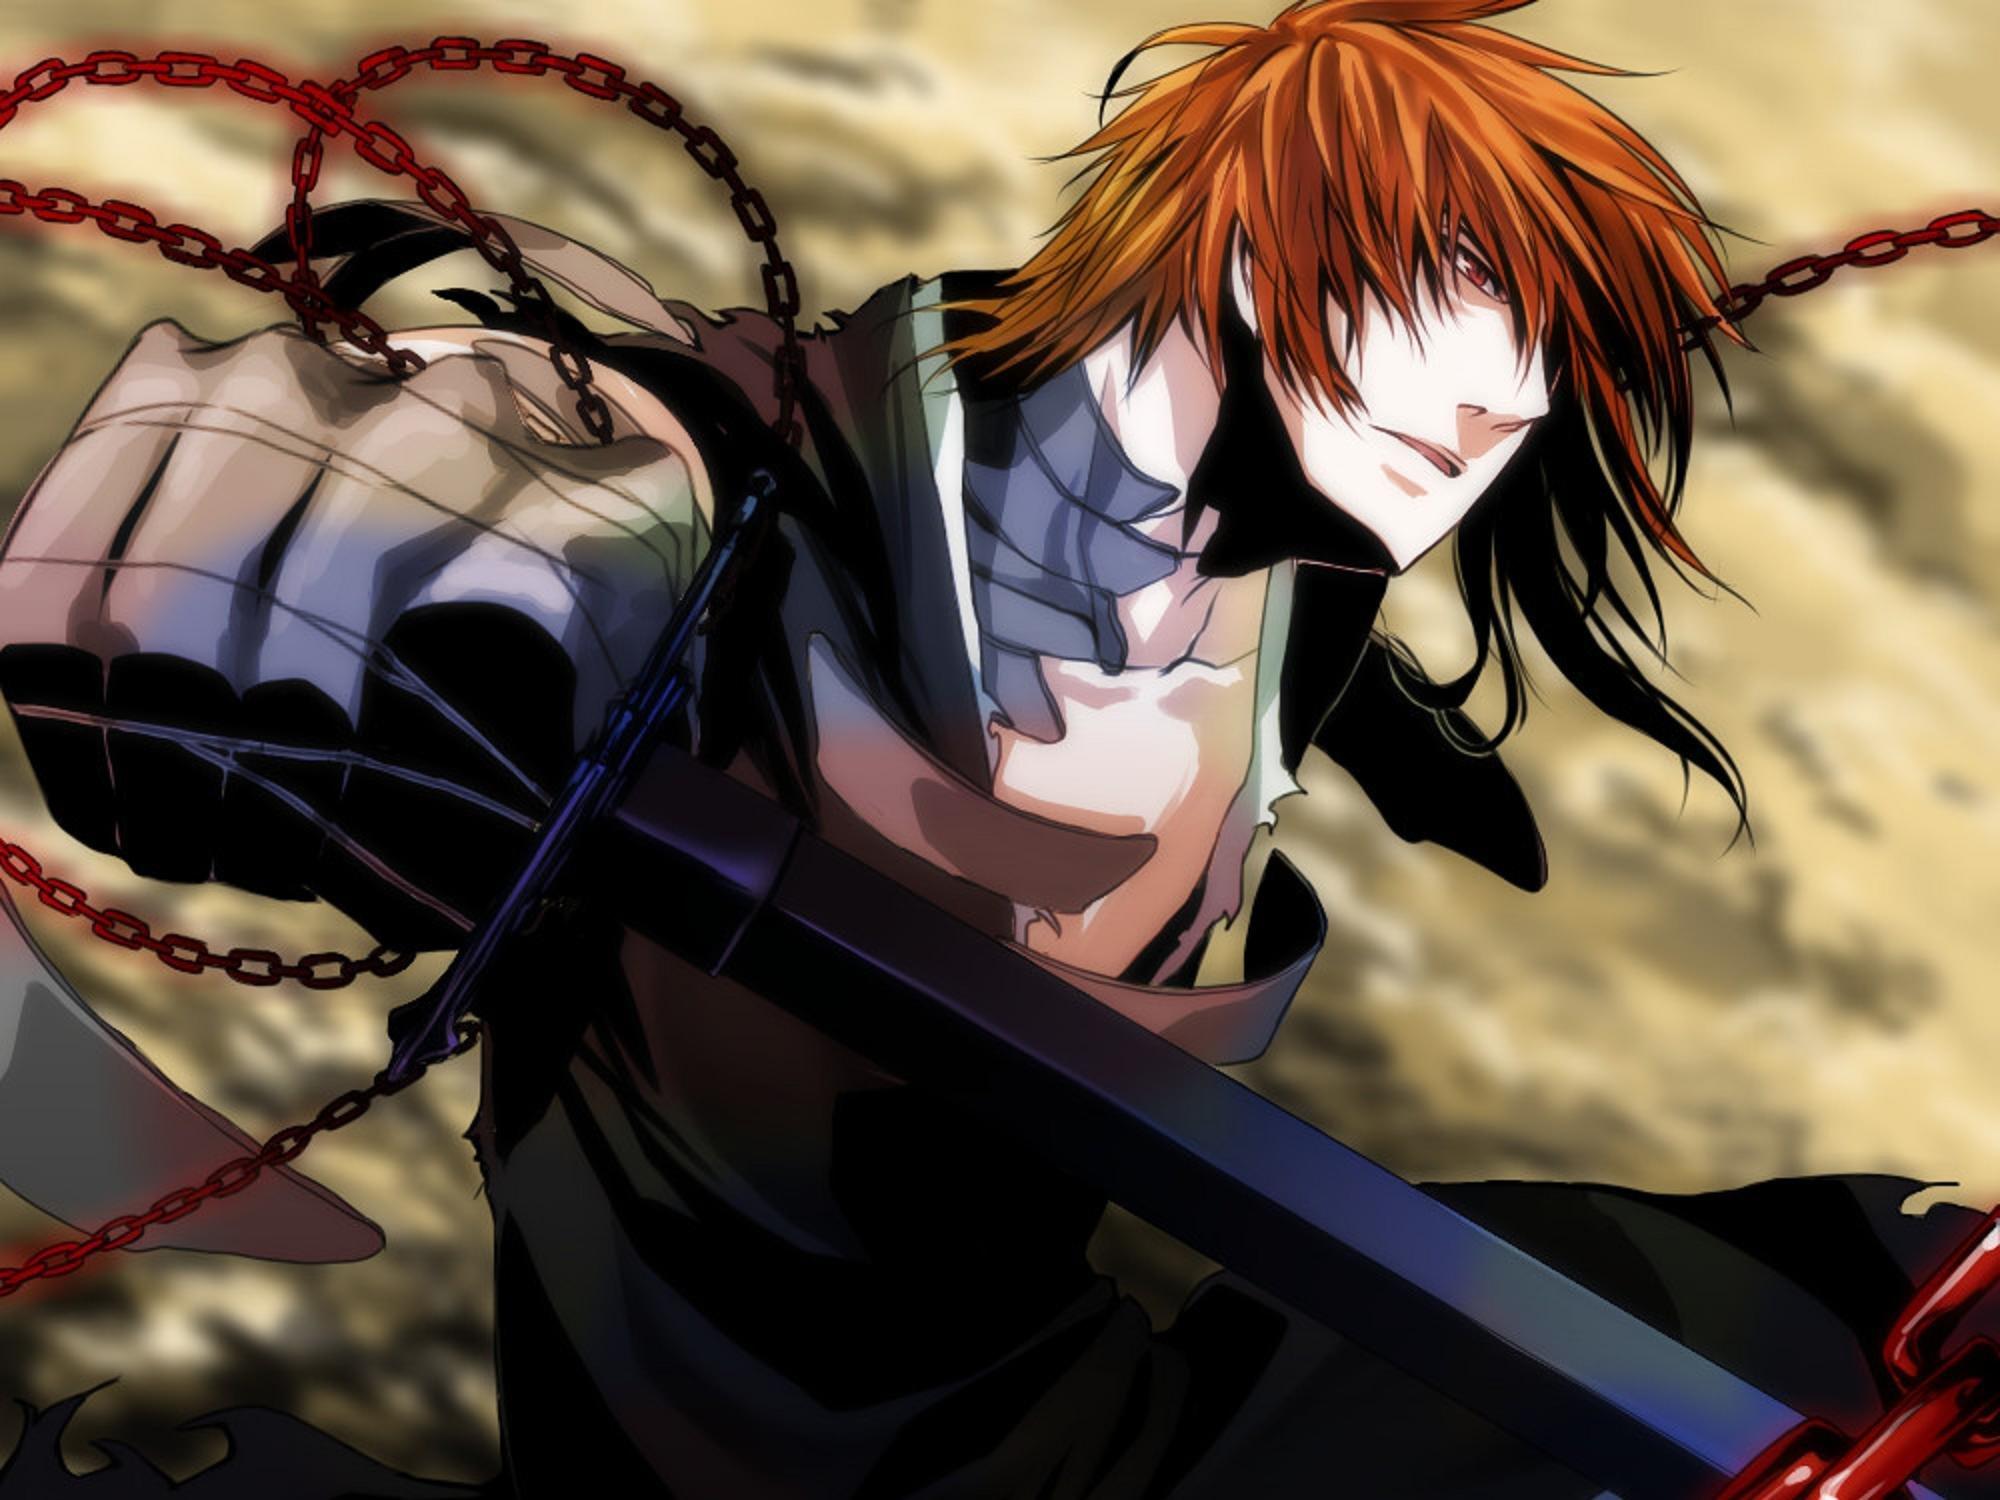 Inuyasha 3d Wallpapers Bleach Anime Series Character Katana Sword Kurosaki Ichigo